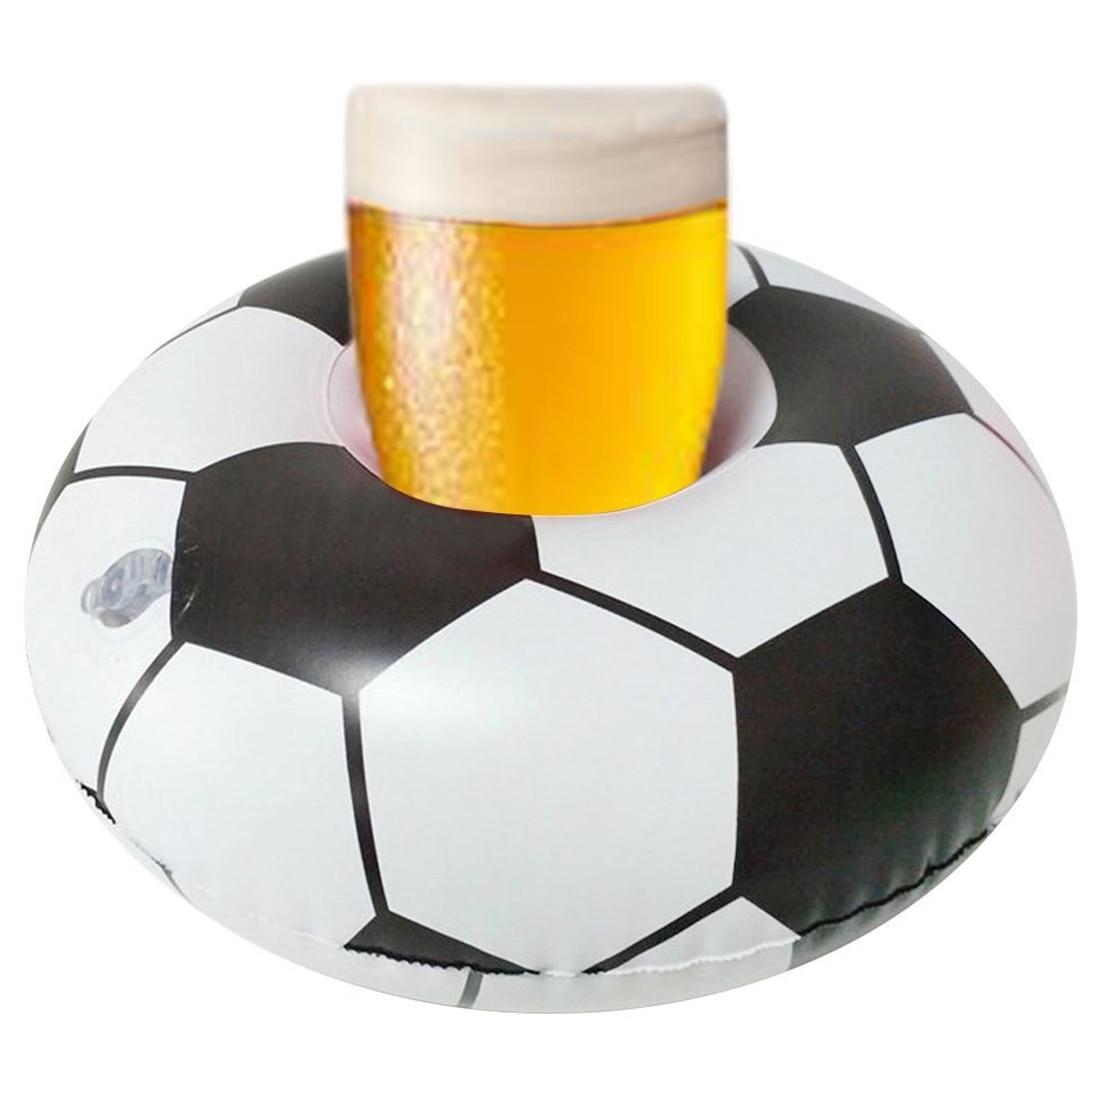 Opblaasbare zwembad Voetbal drink beker bier houder speelgoed cup stand Water Mat Drijvende bekerhouder zwembad Party accessoires